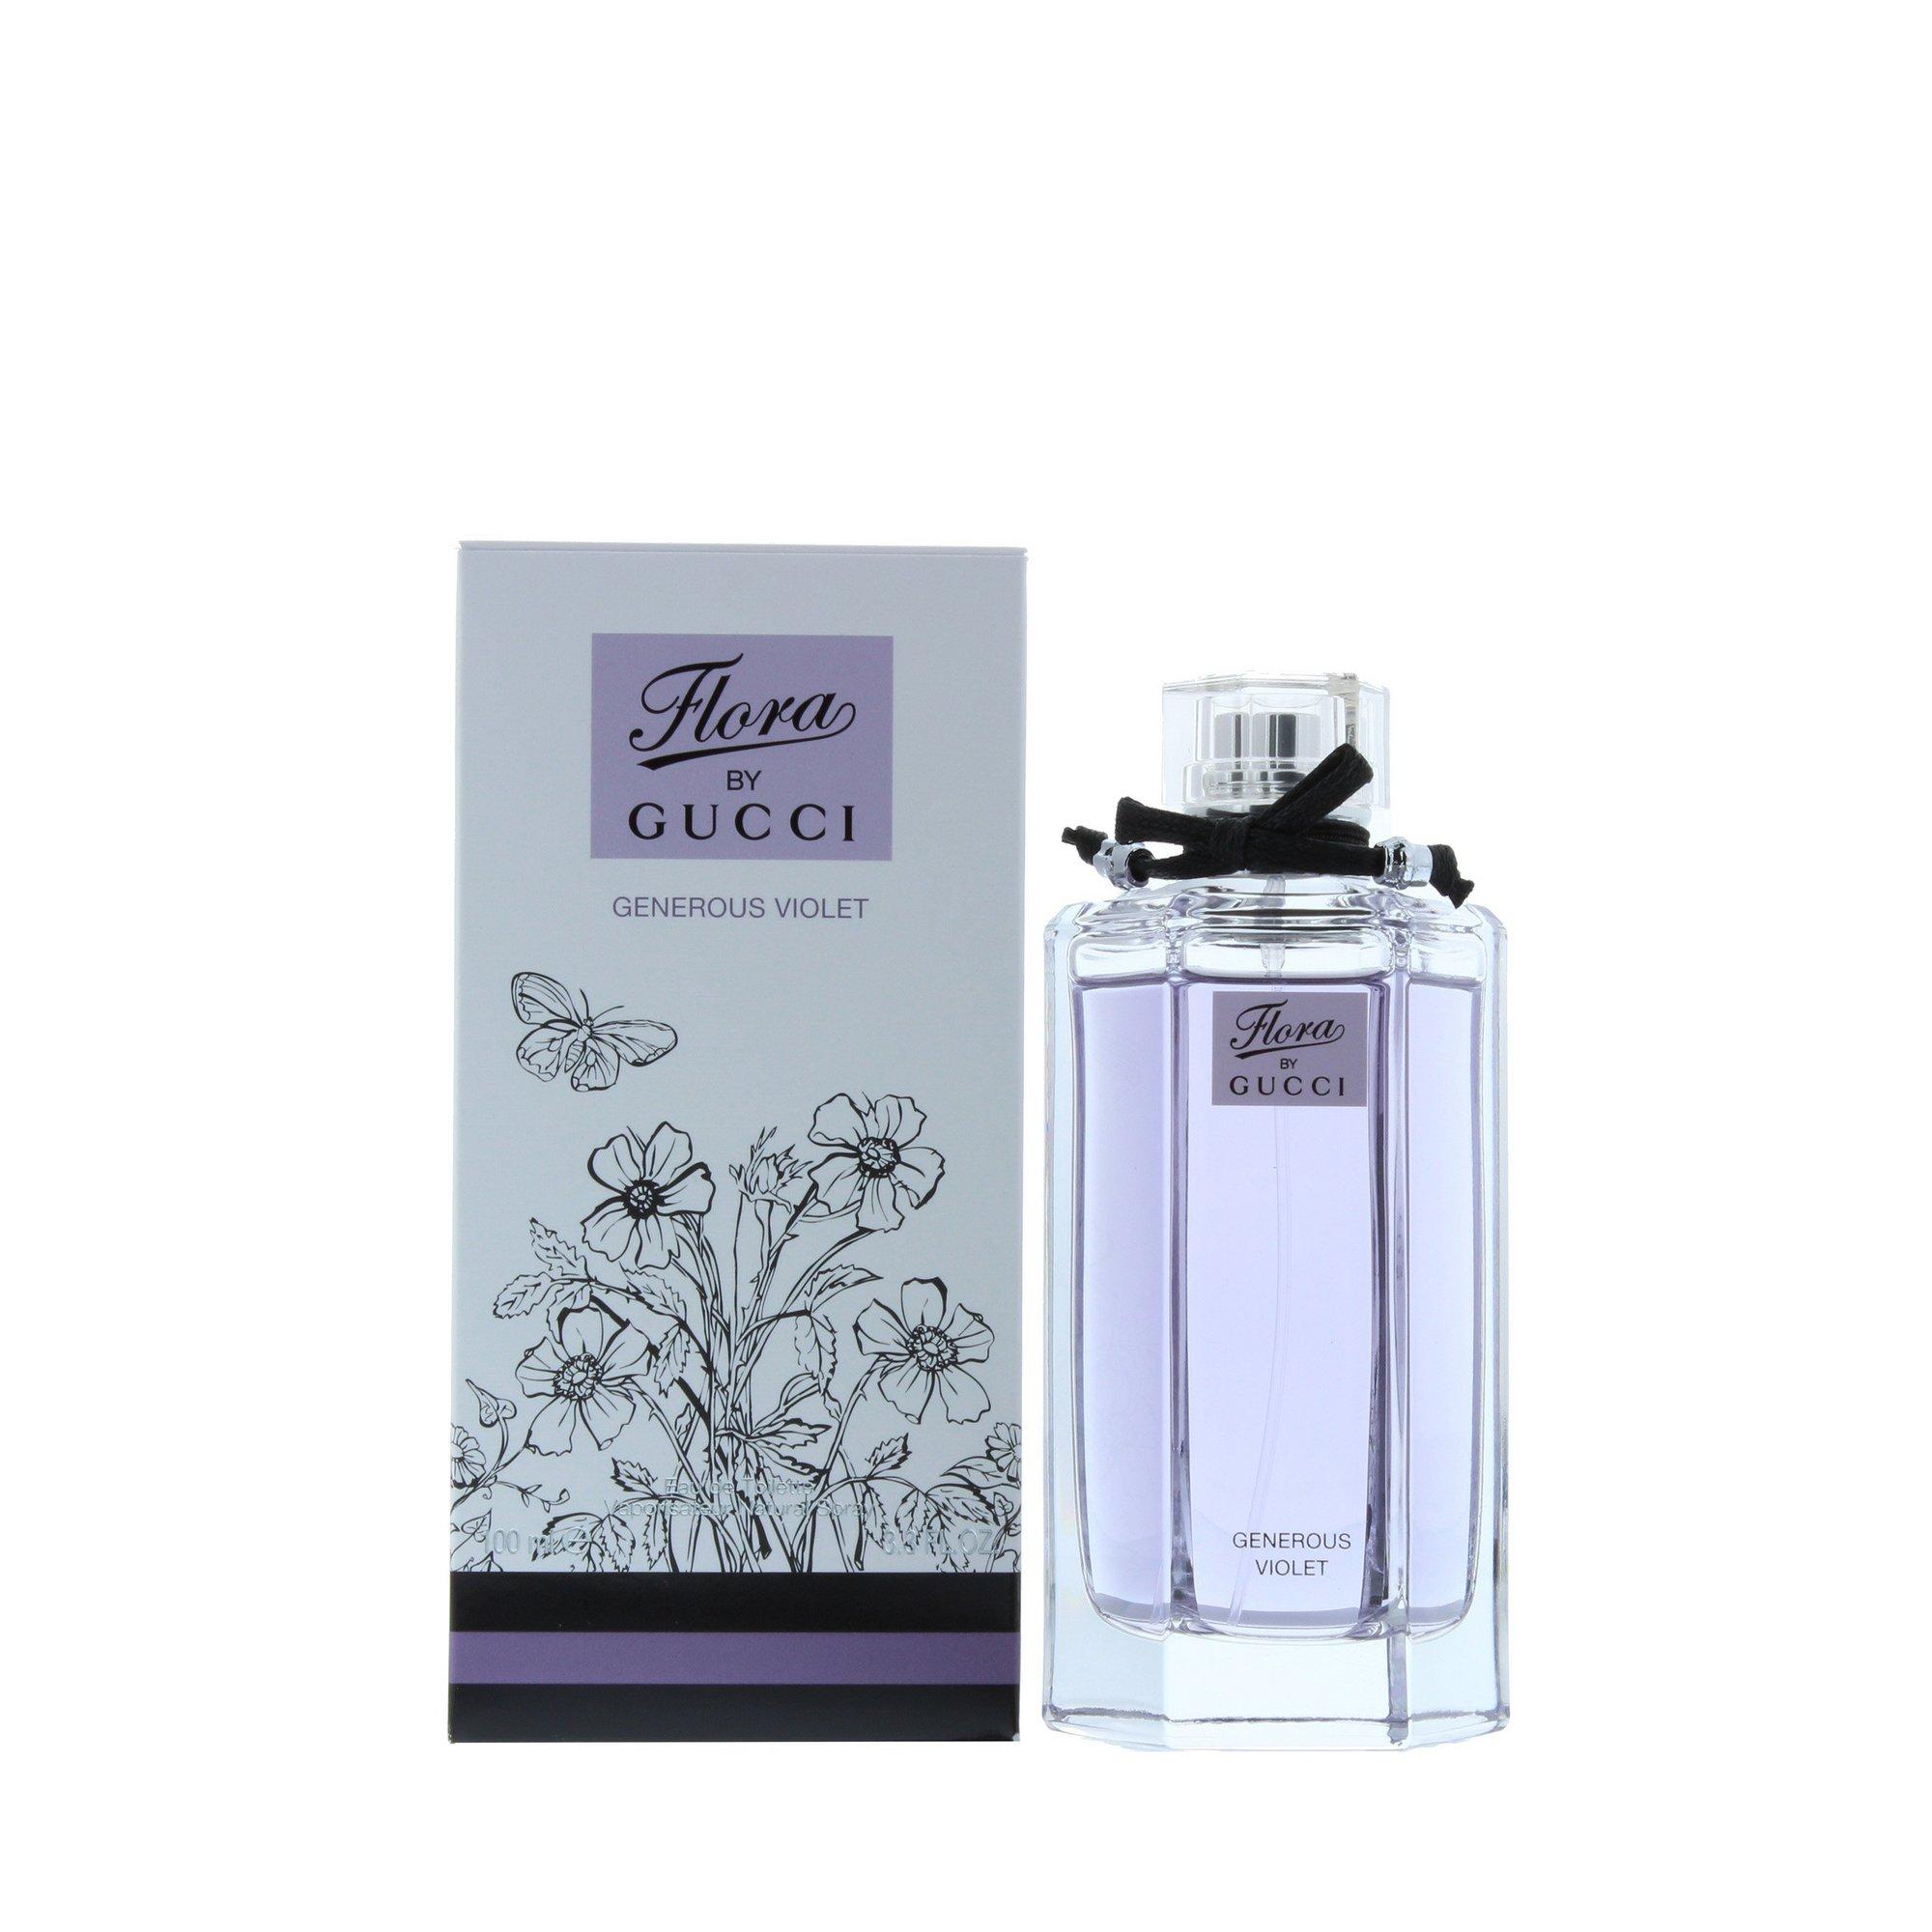 Image of Gucci Flora Generous Violet 100ml EDT